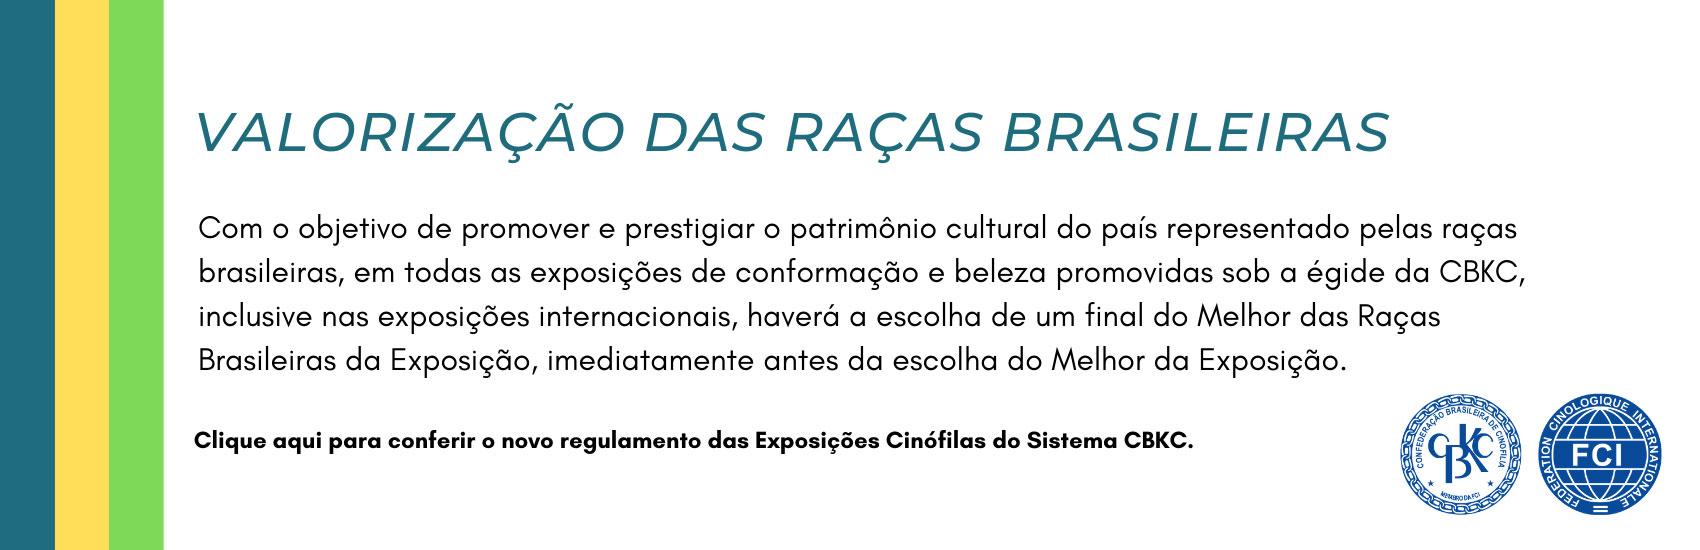 CBKC - Raças Brasileiras CBKC.